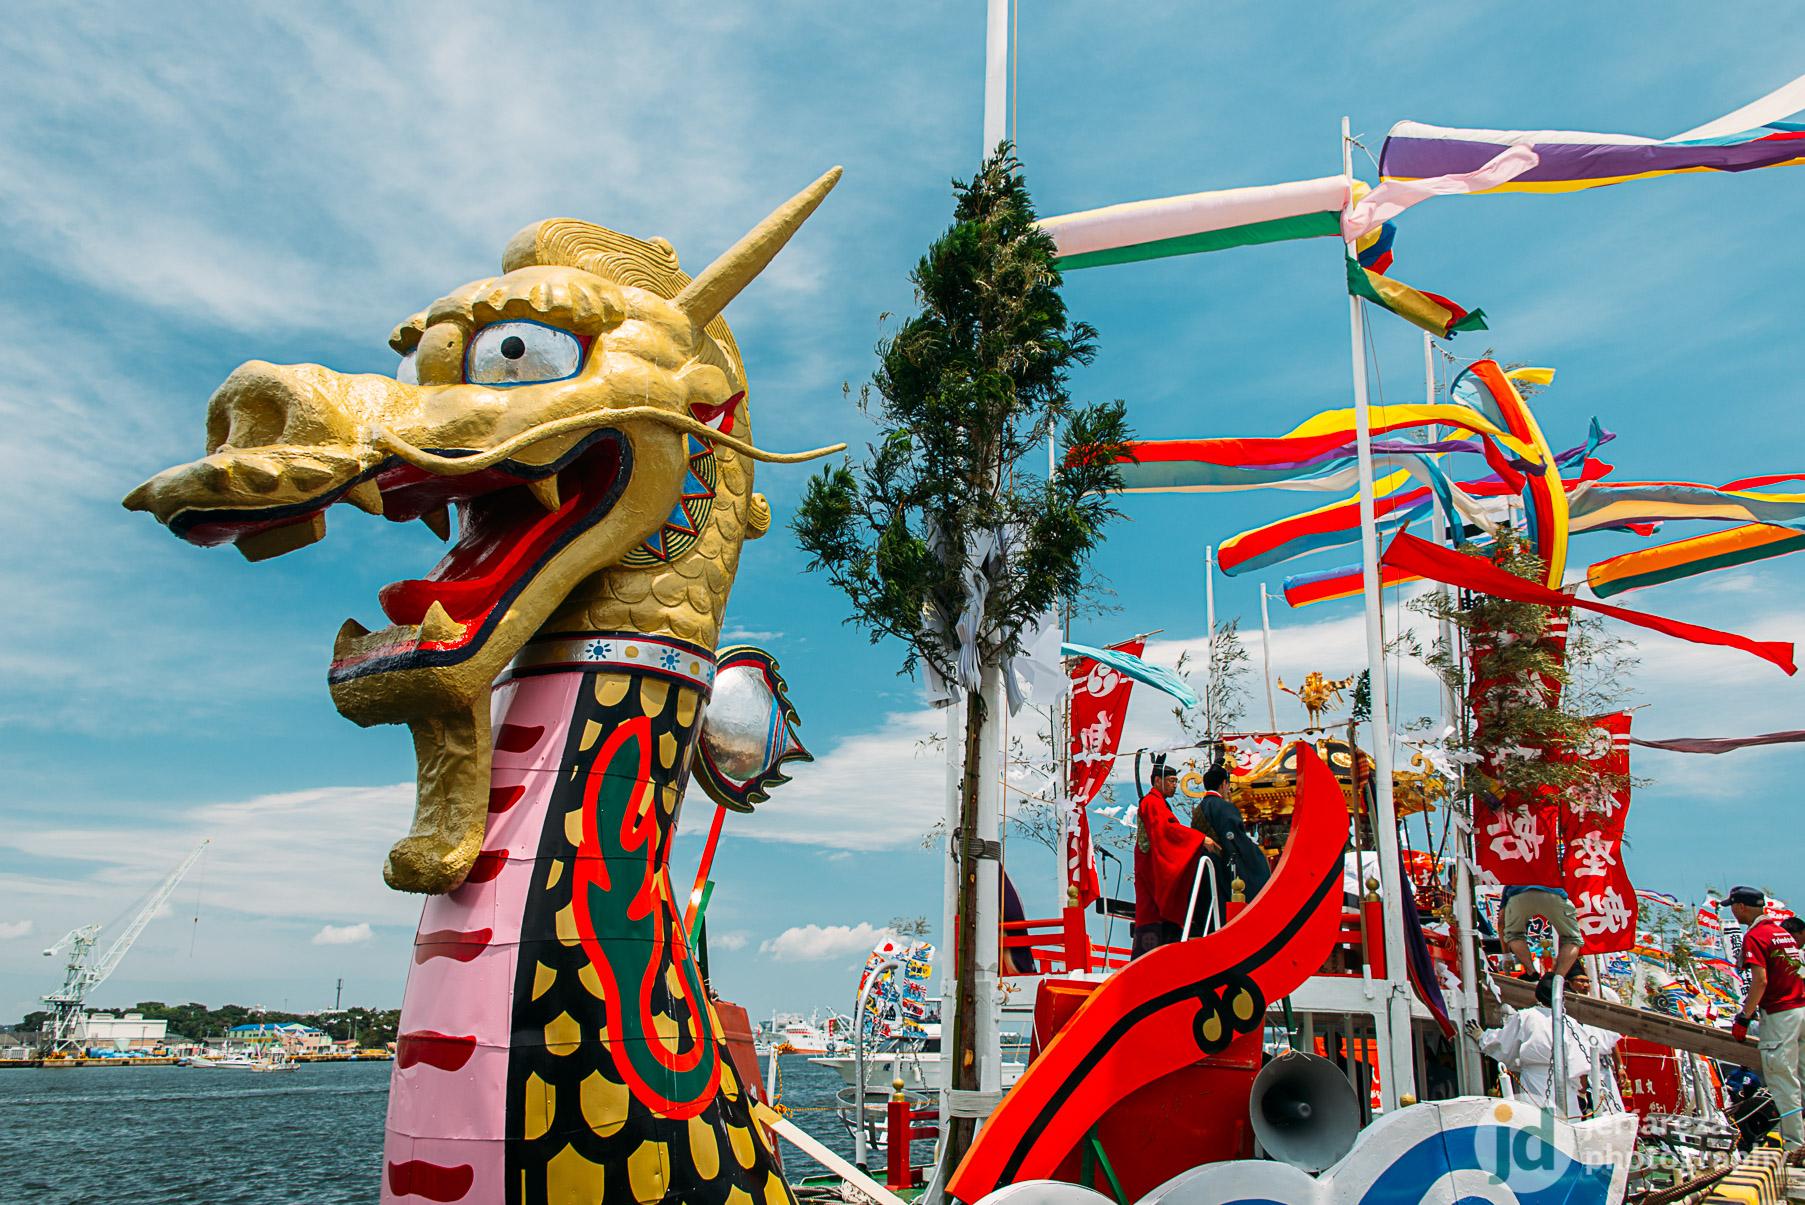 Shiogama Minato Festival, the Parade of the Dragon Boats